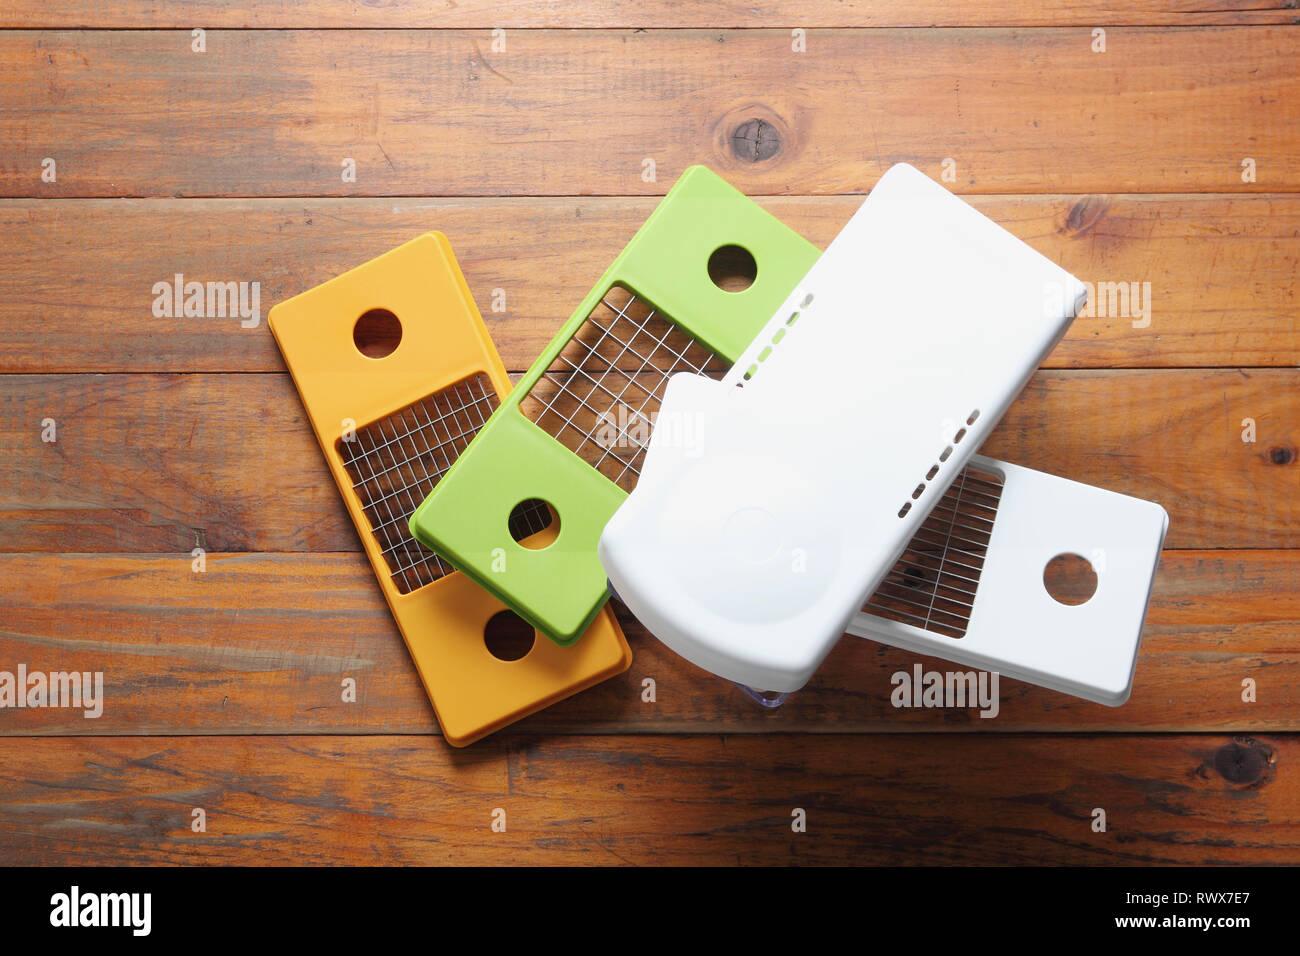 Vegetable Slicer on Wooden Background Stock Photo